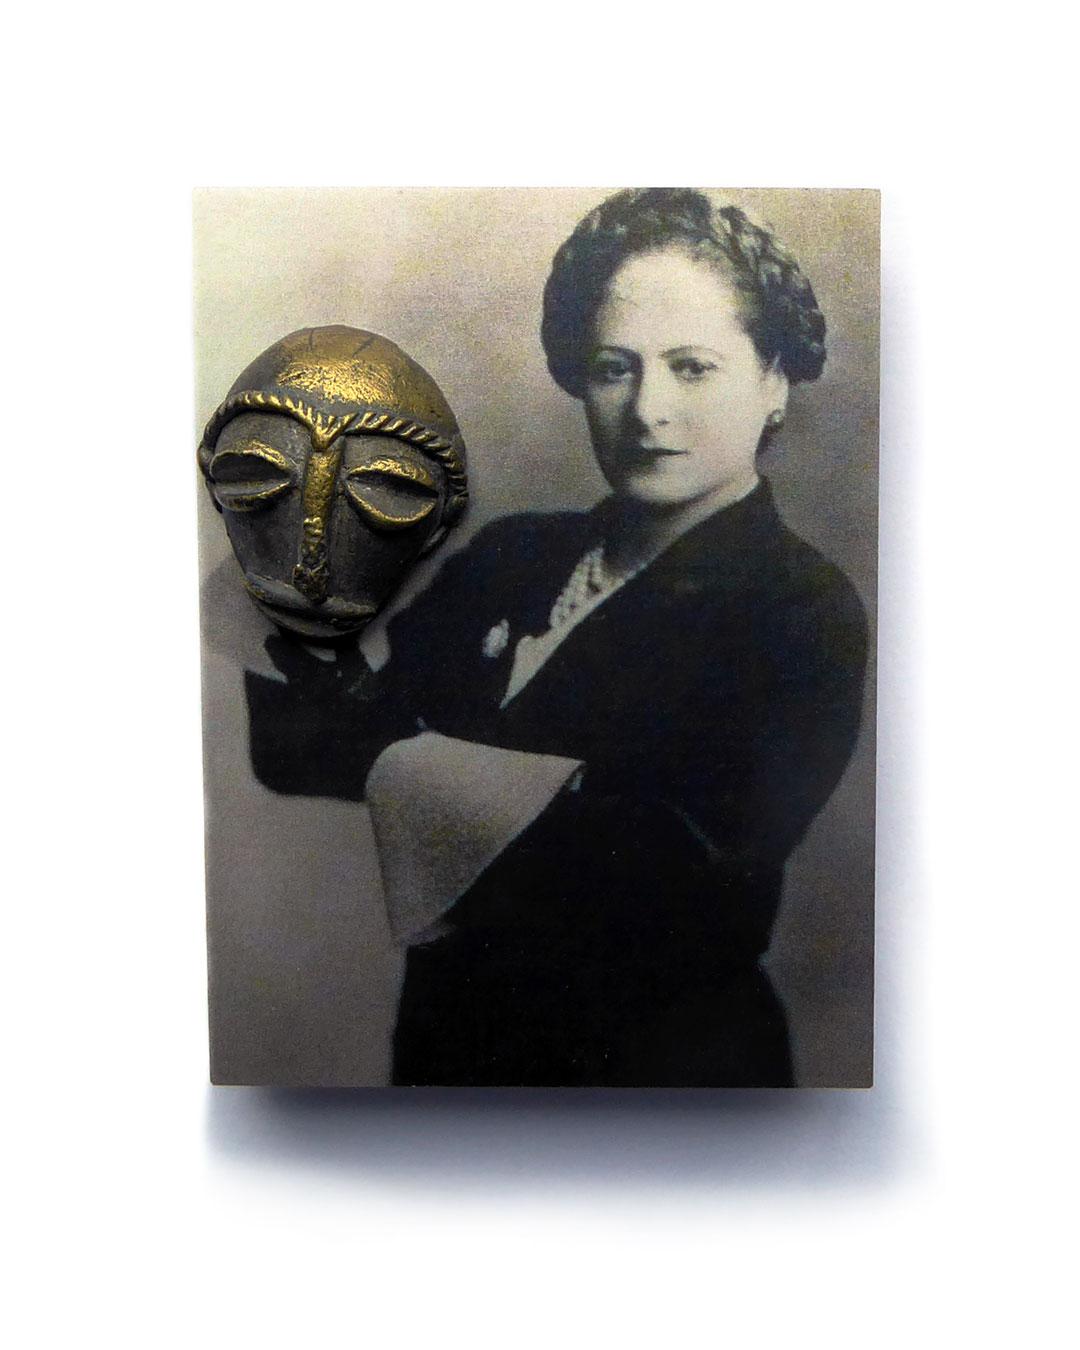 Herman Hermsen, The Mask, 2018, brooch; print on aluminium, wood, brass, 79 x 59 x 24 mm, €425